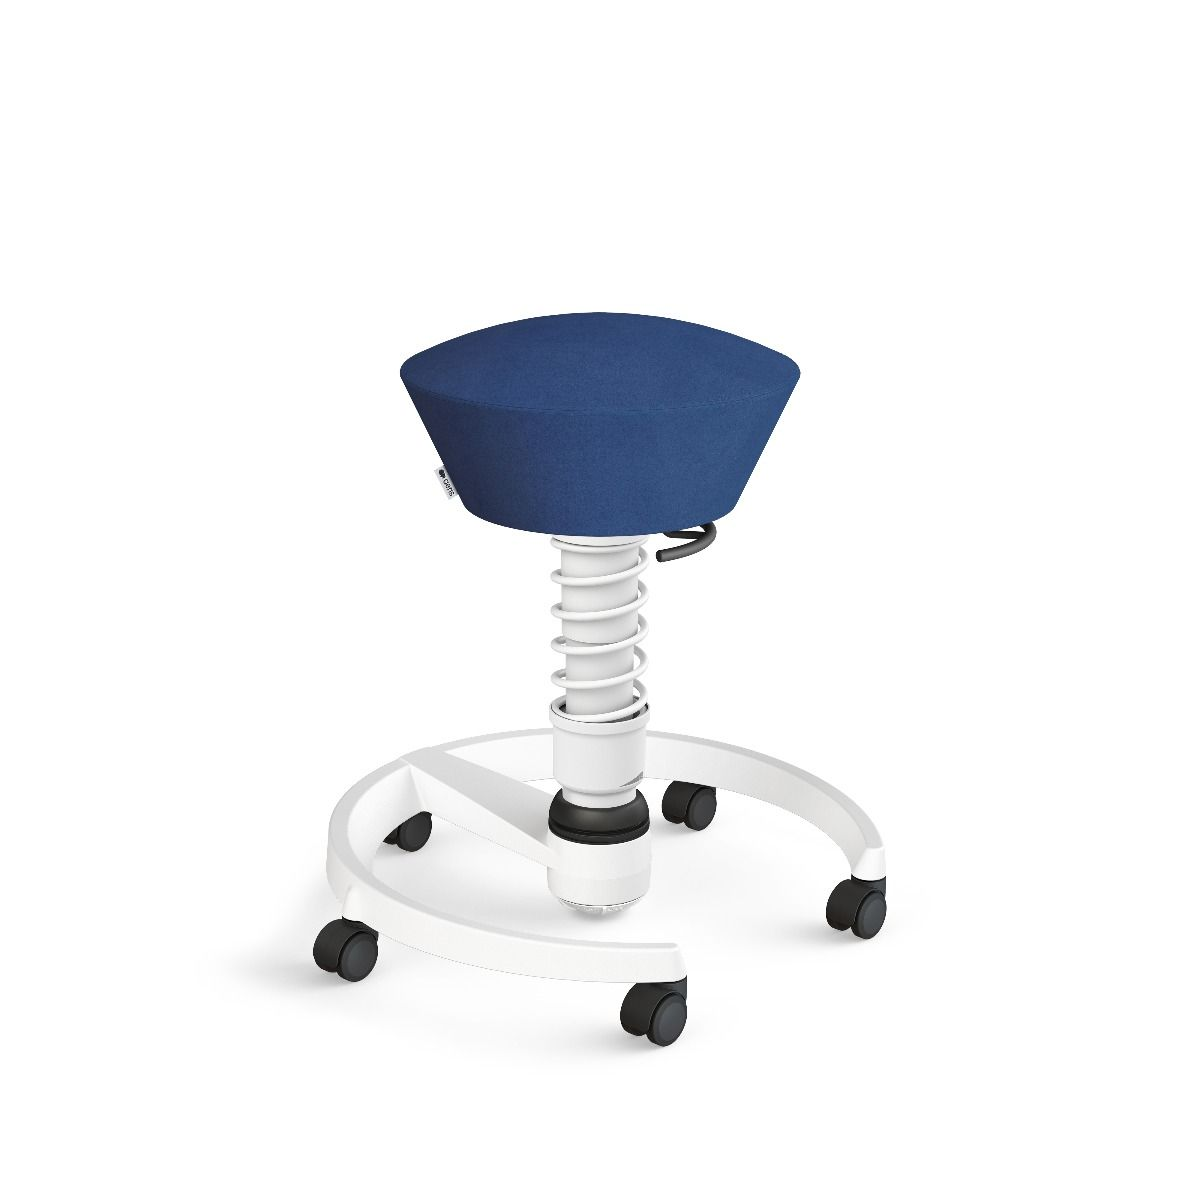 Rolling Swopper weiss Mikrofaser (Comfort) blau